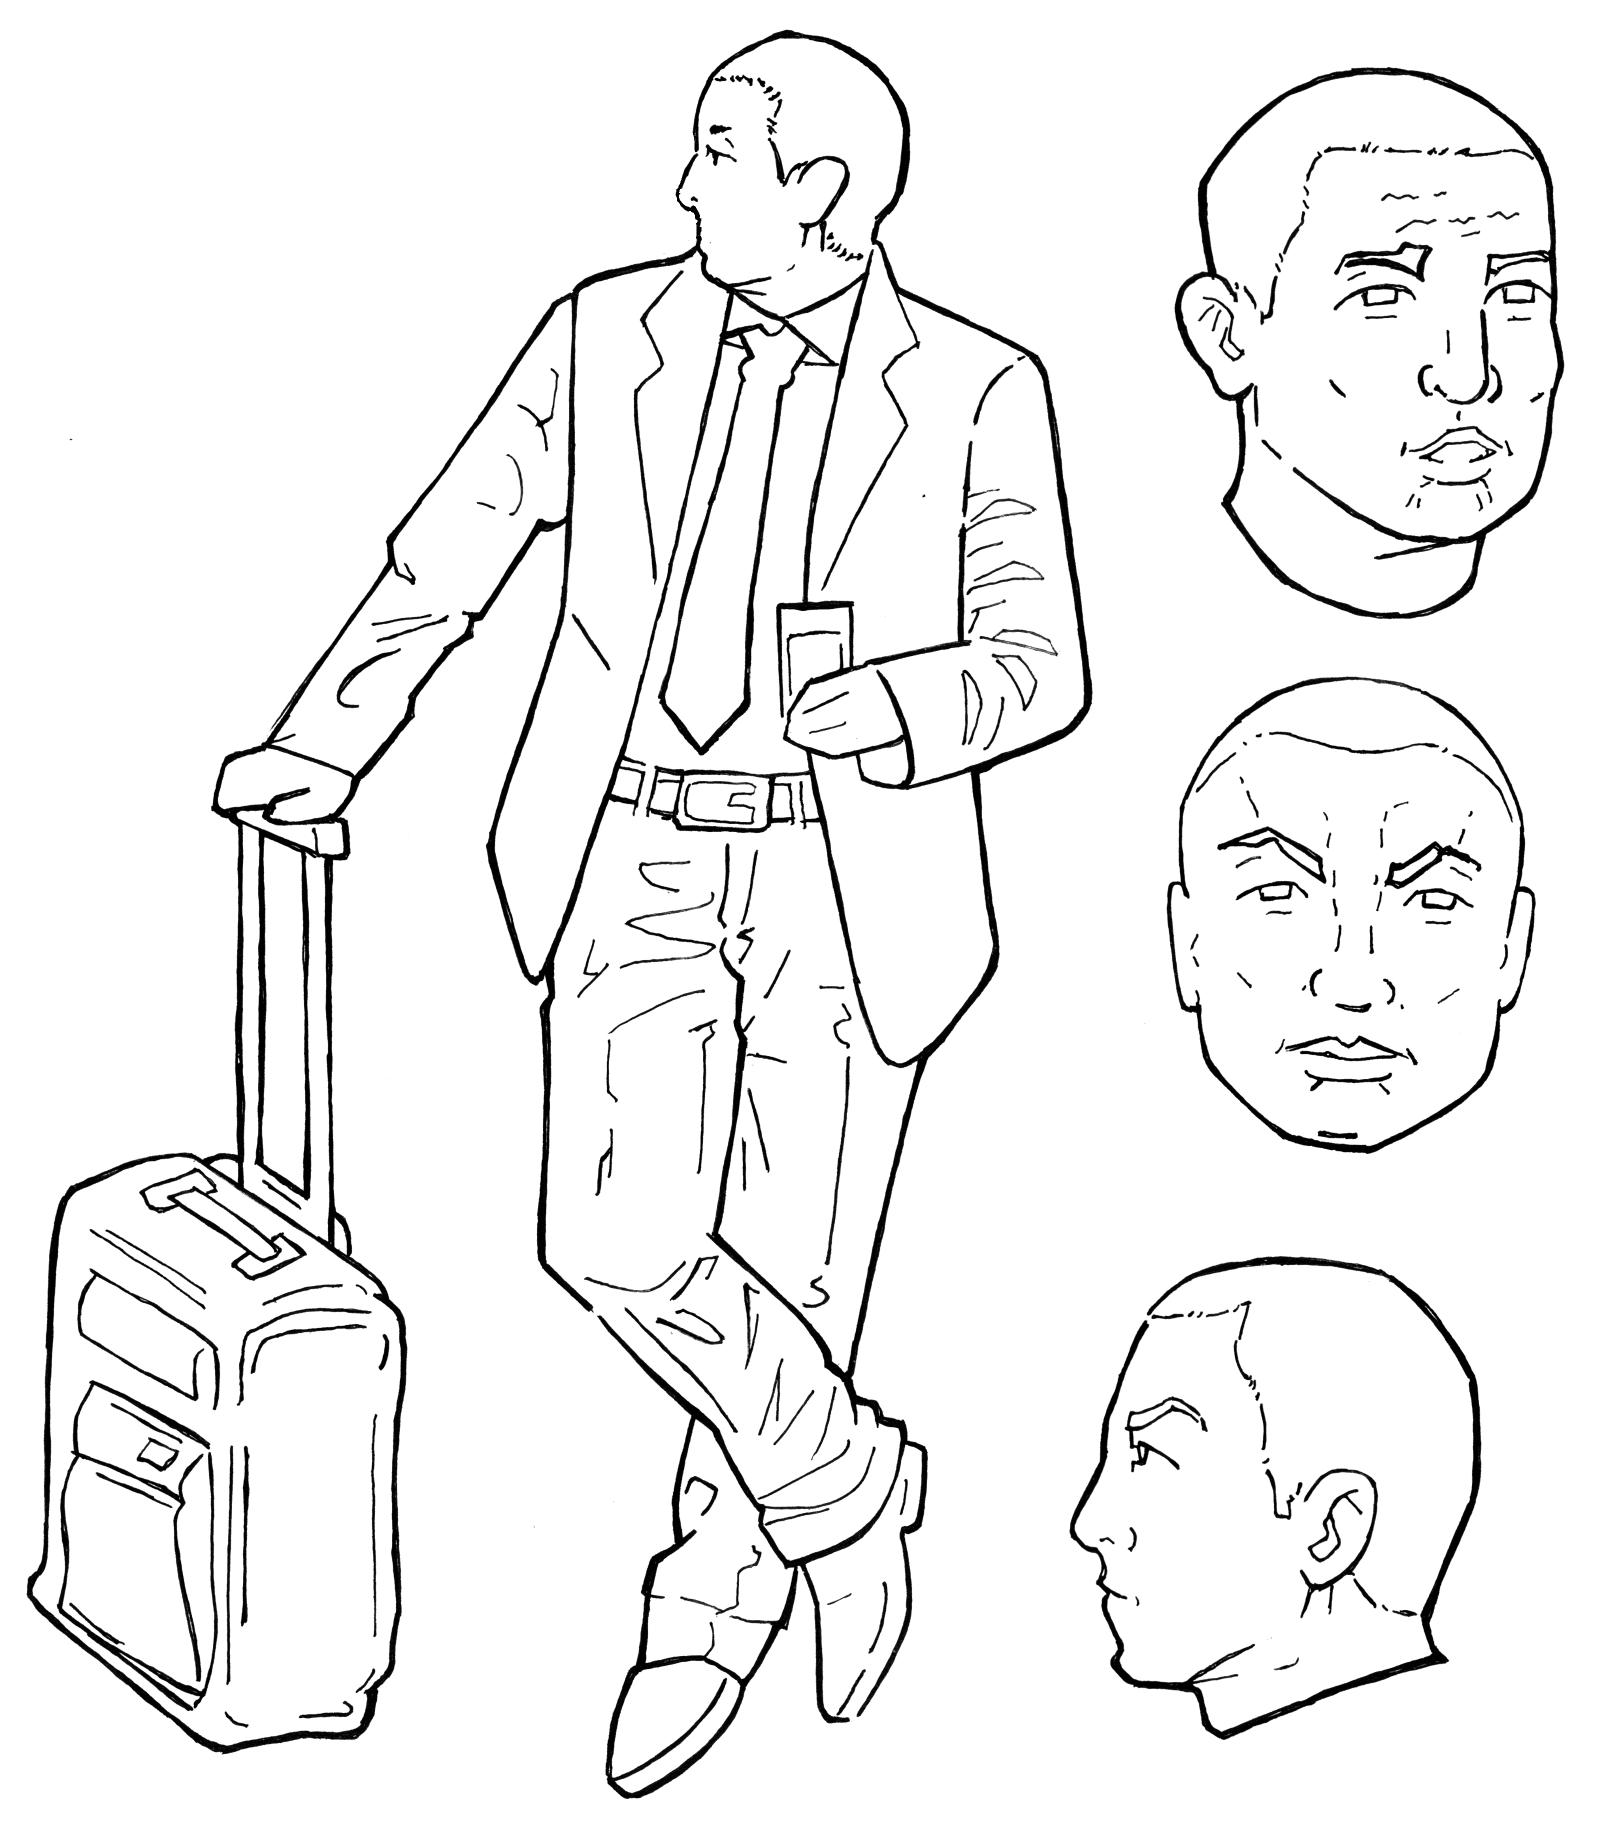 Character design for Jack